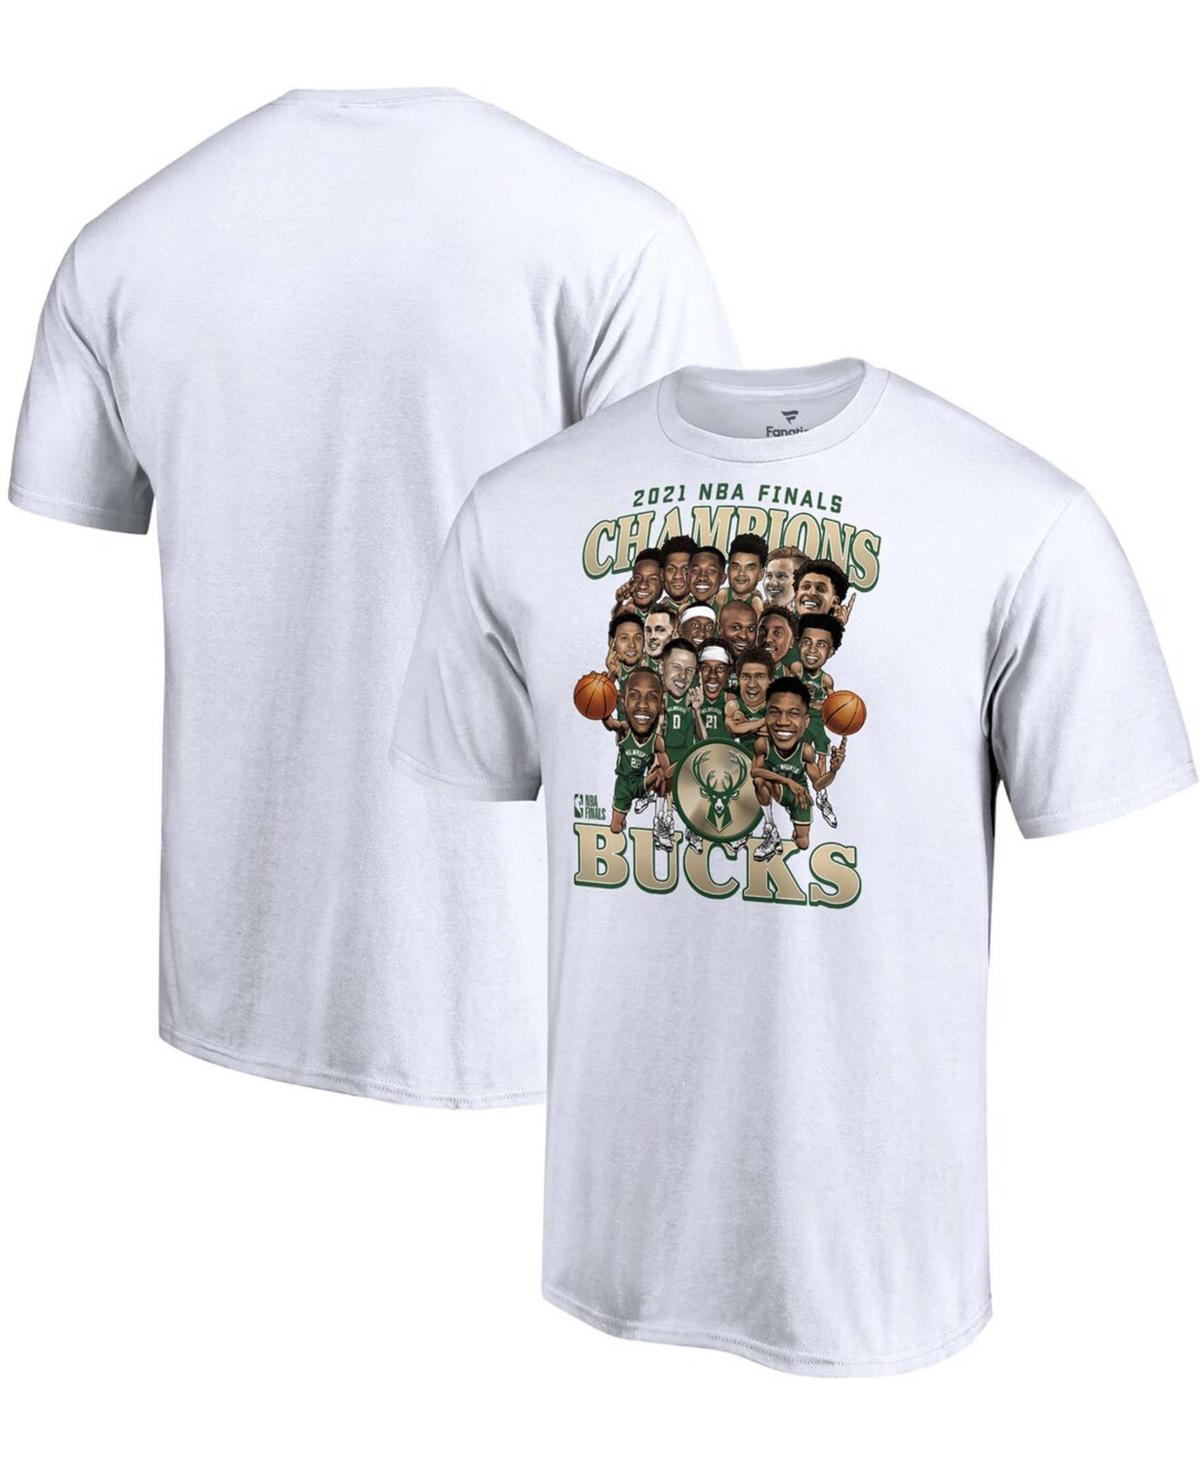 Men's White Milwaukee Bucks 2021 Nba Finals Champions Team Caricature Roster T-shirt